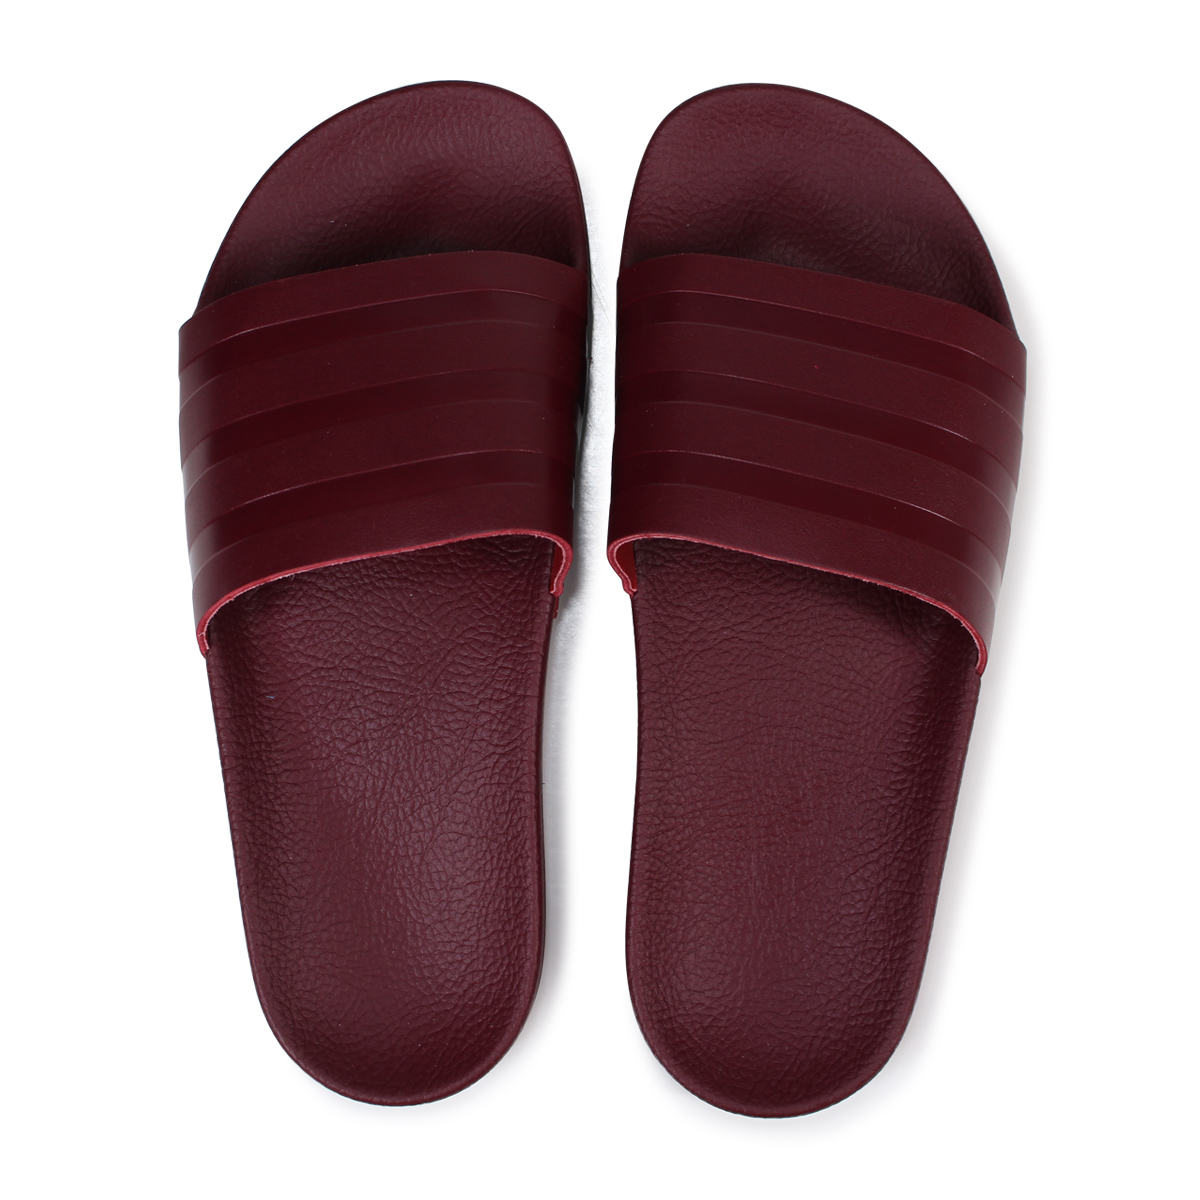 53f0f2d92 ALLSPORTS  アディダスアディレッタ adidas Originals sandals shower ...